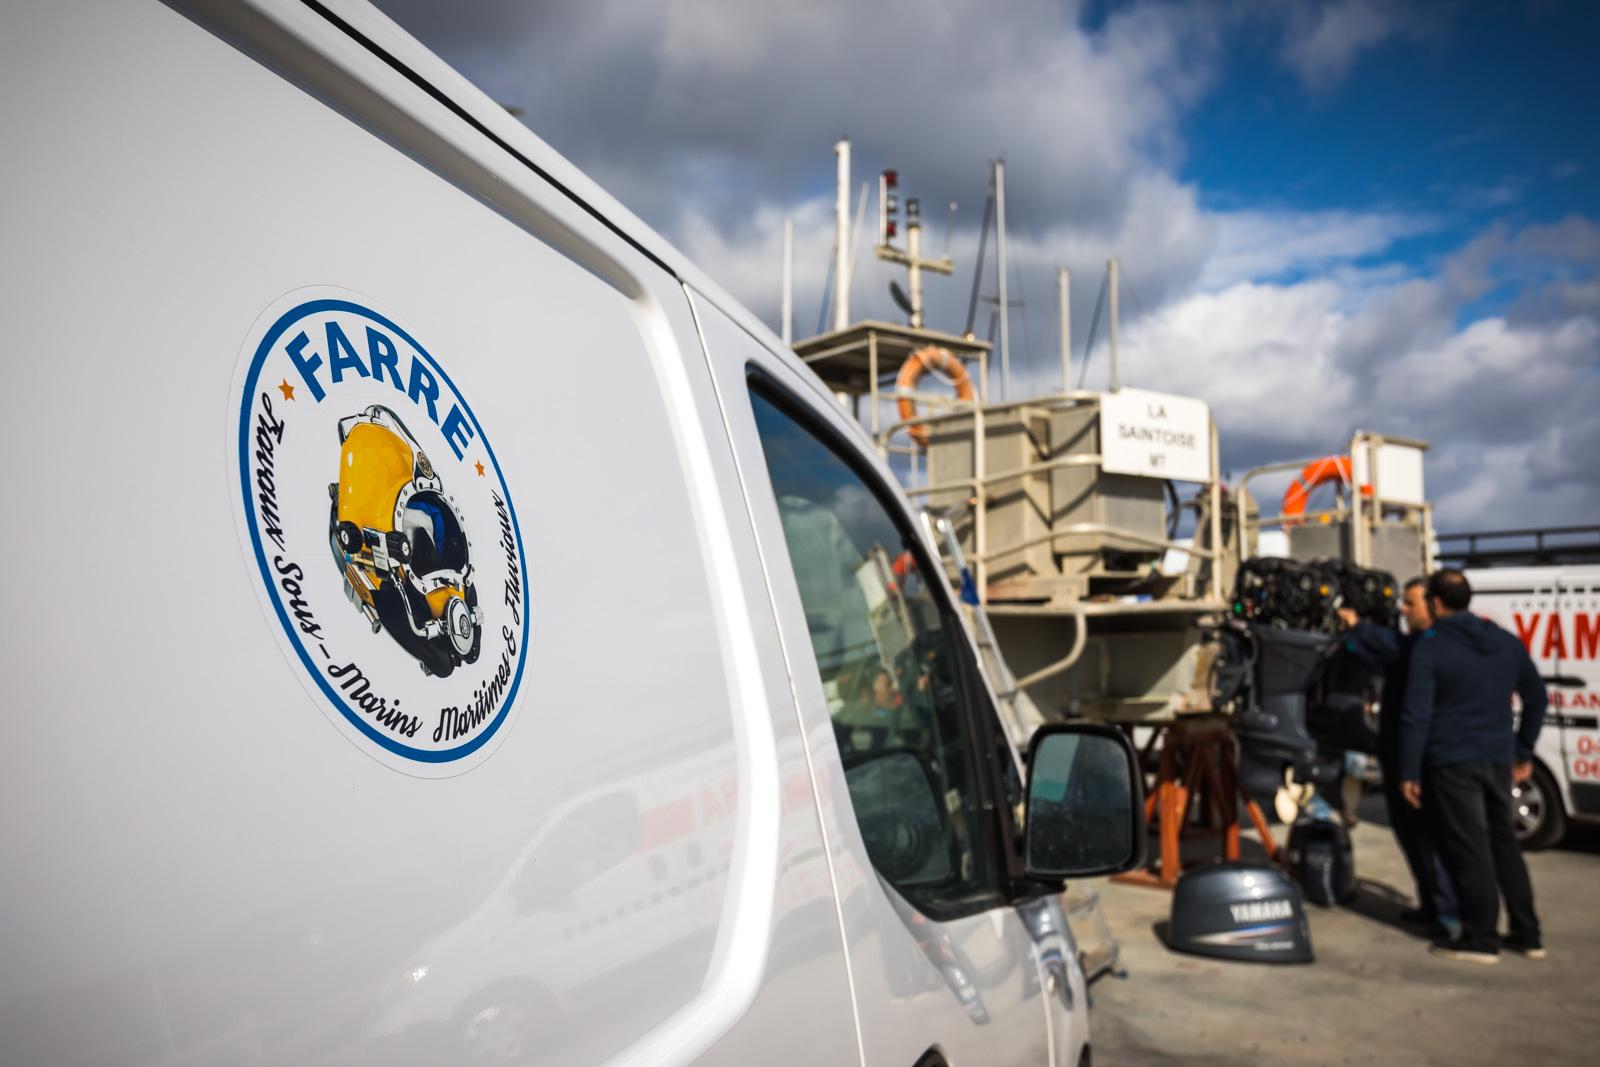 Travaux maritimes sète entreprise farre